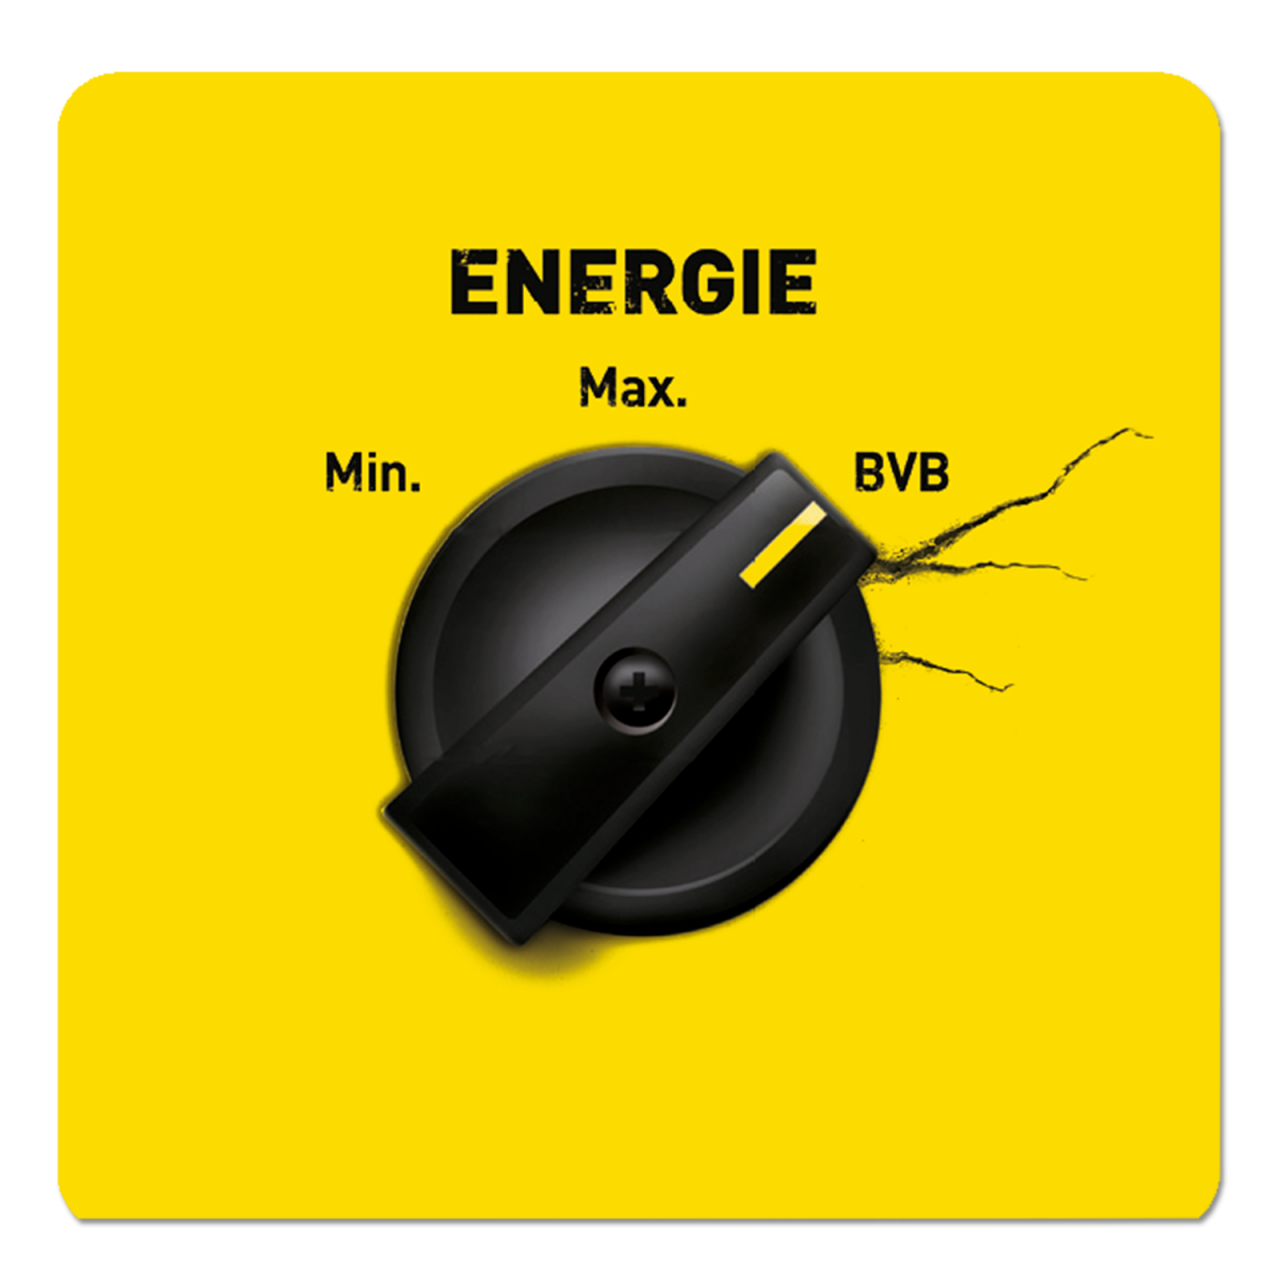 BVB-Aufkleberkarte Voltmesser